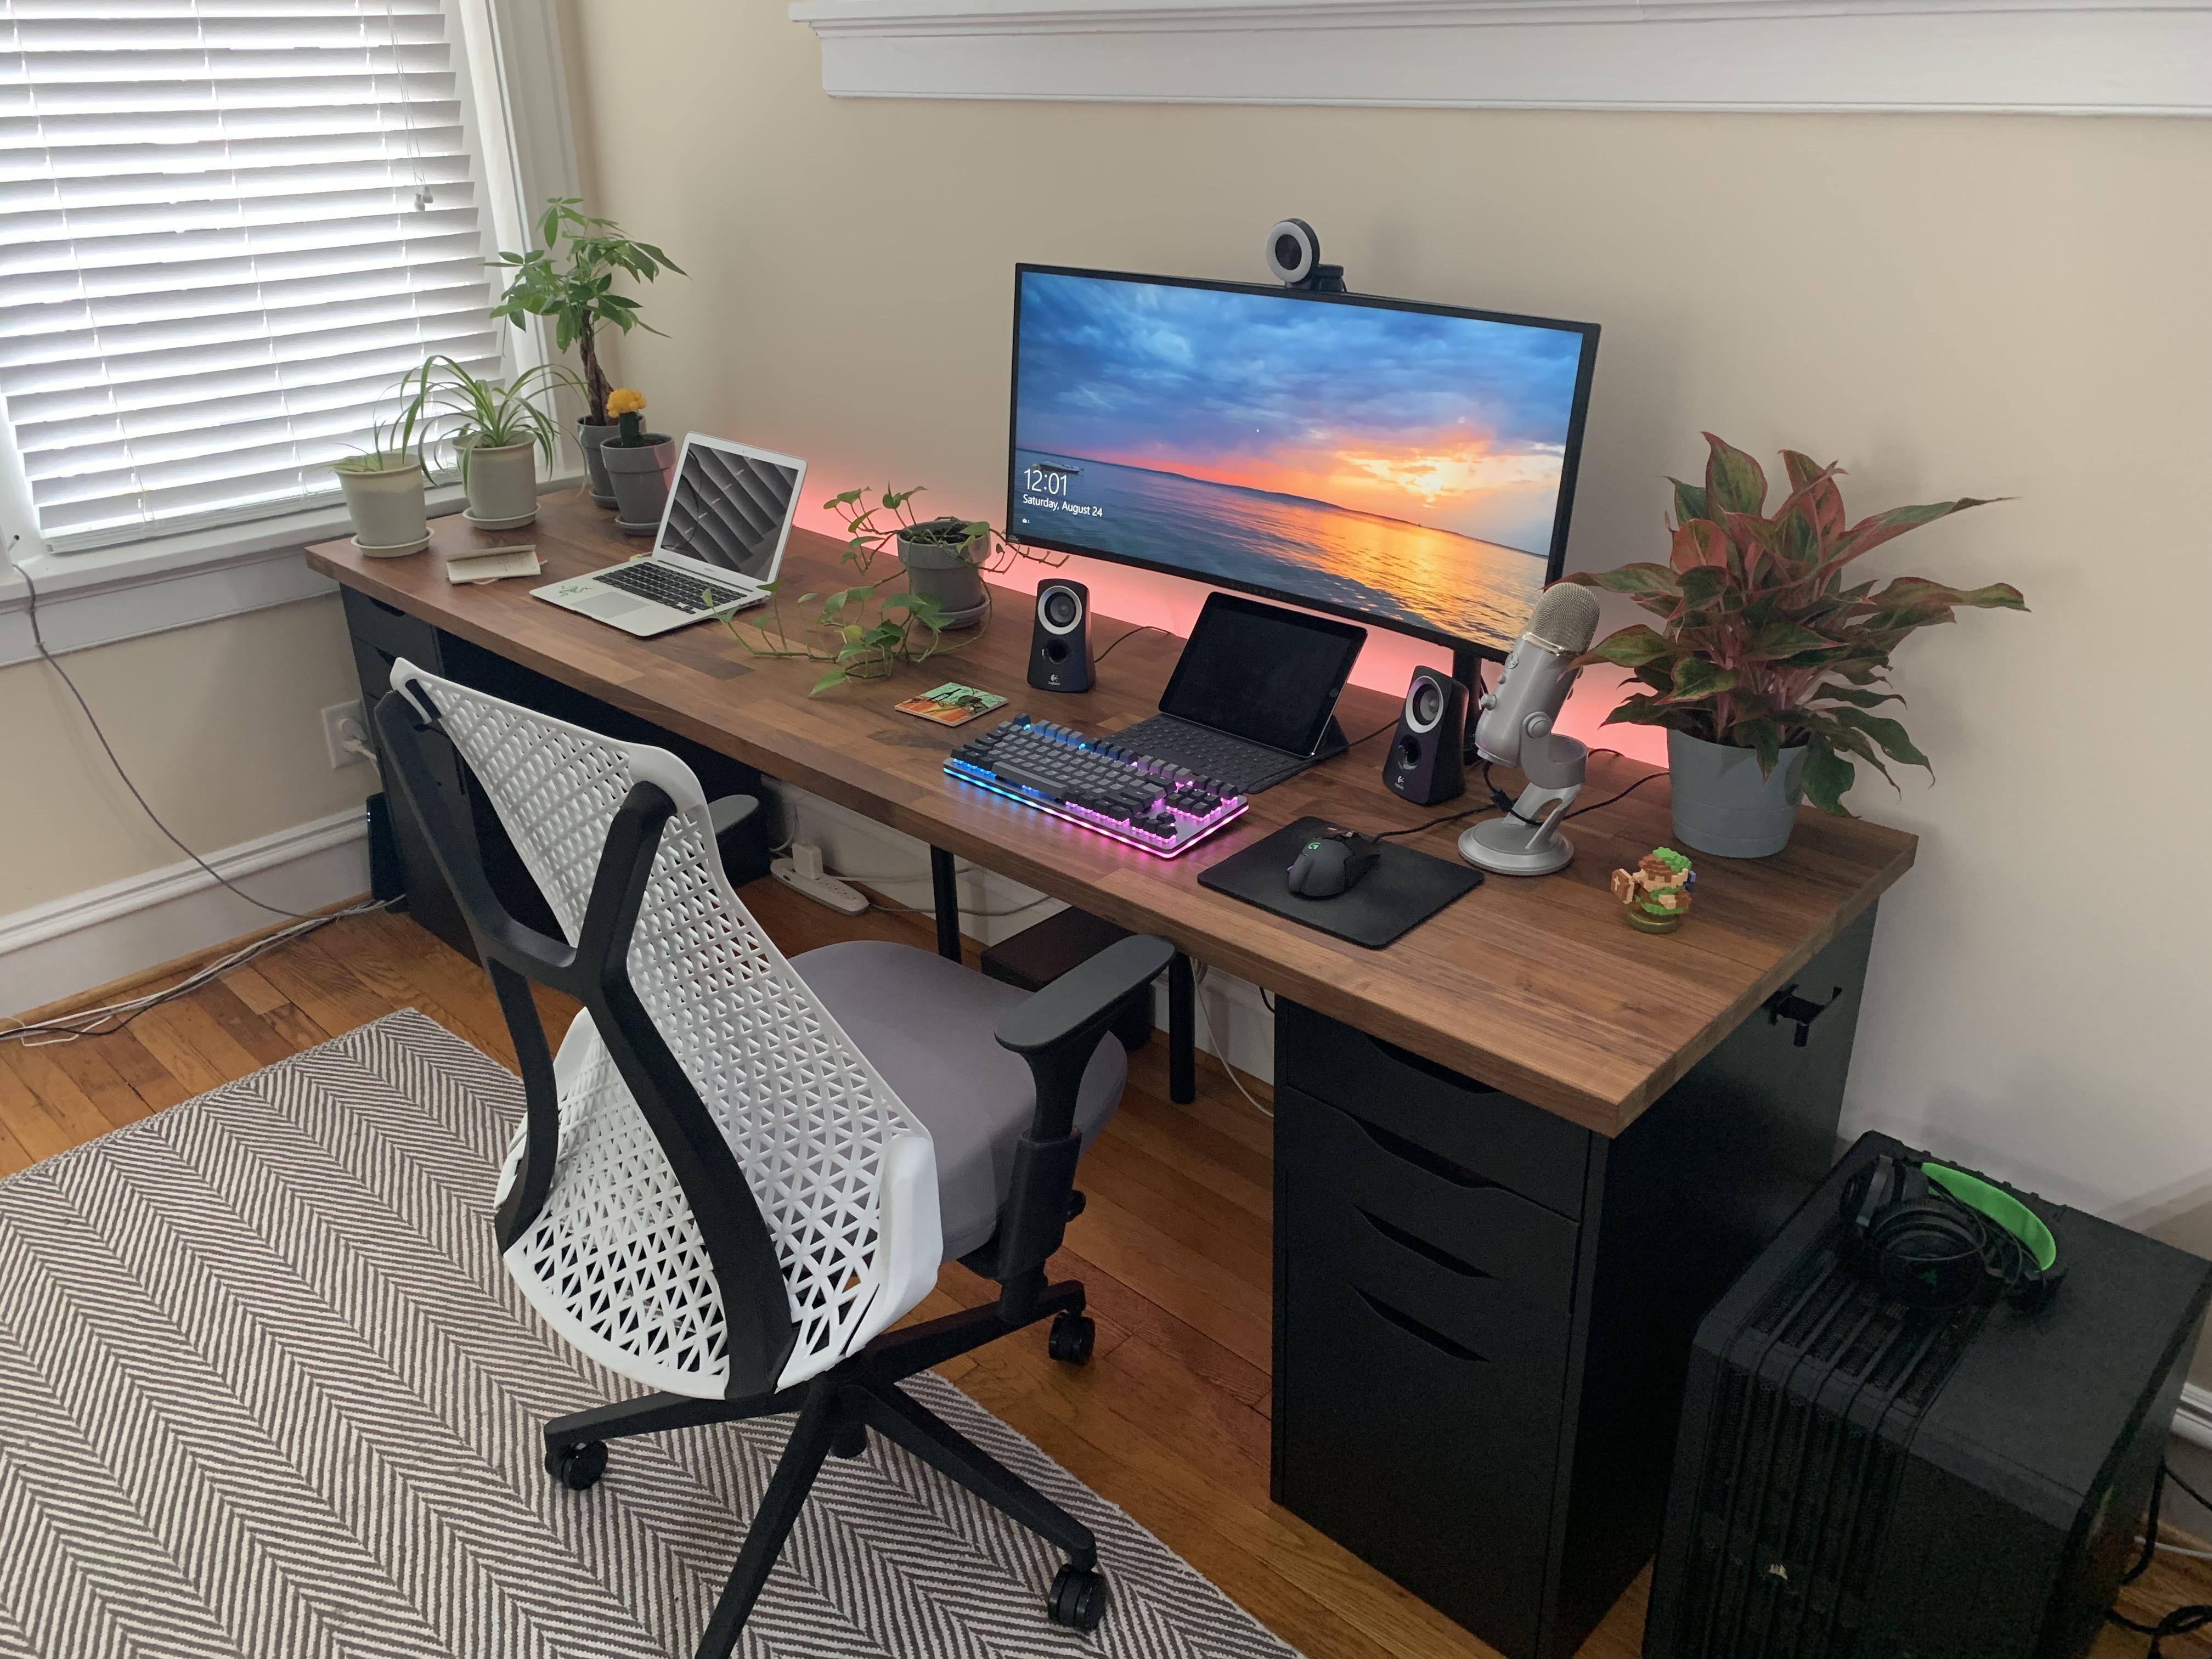 My PC Mac Setup! Gaming room setup, Mac setup, Simple